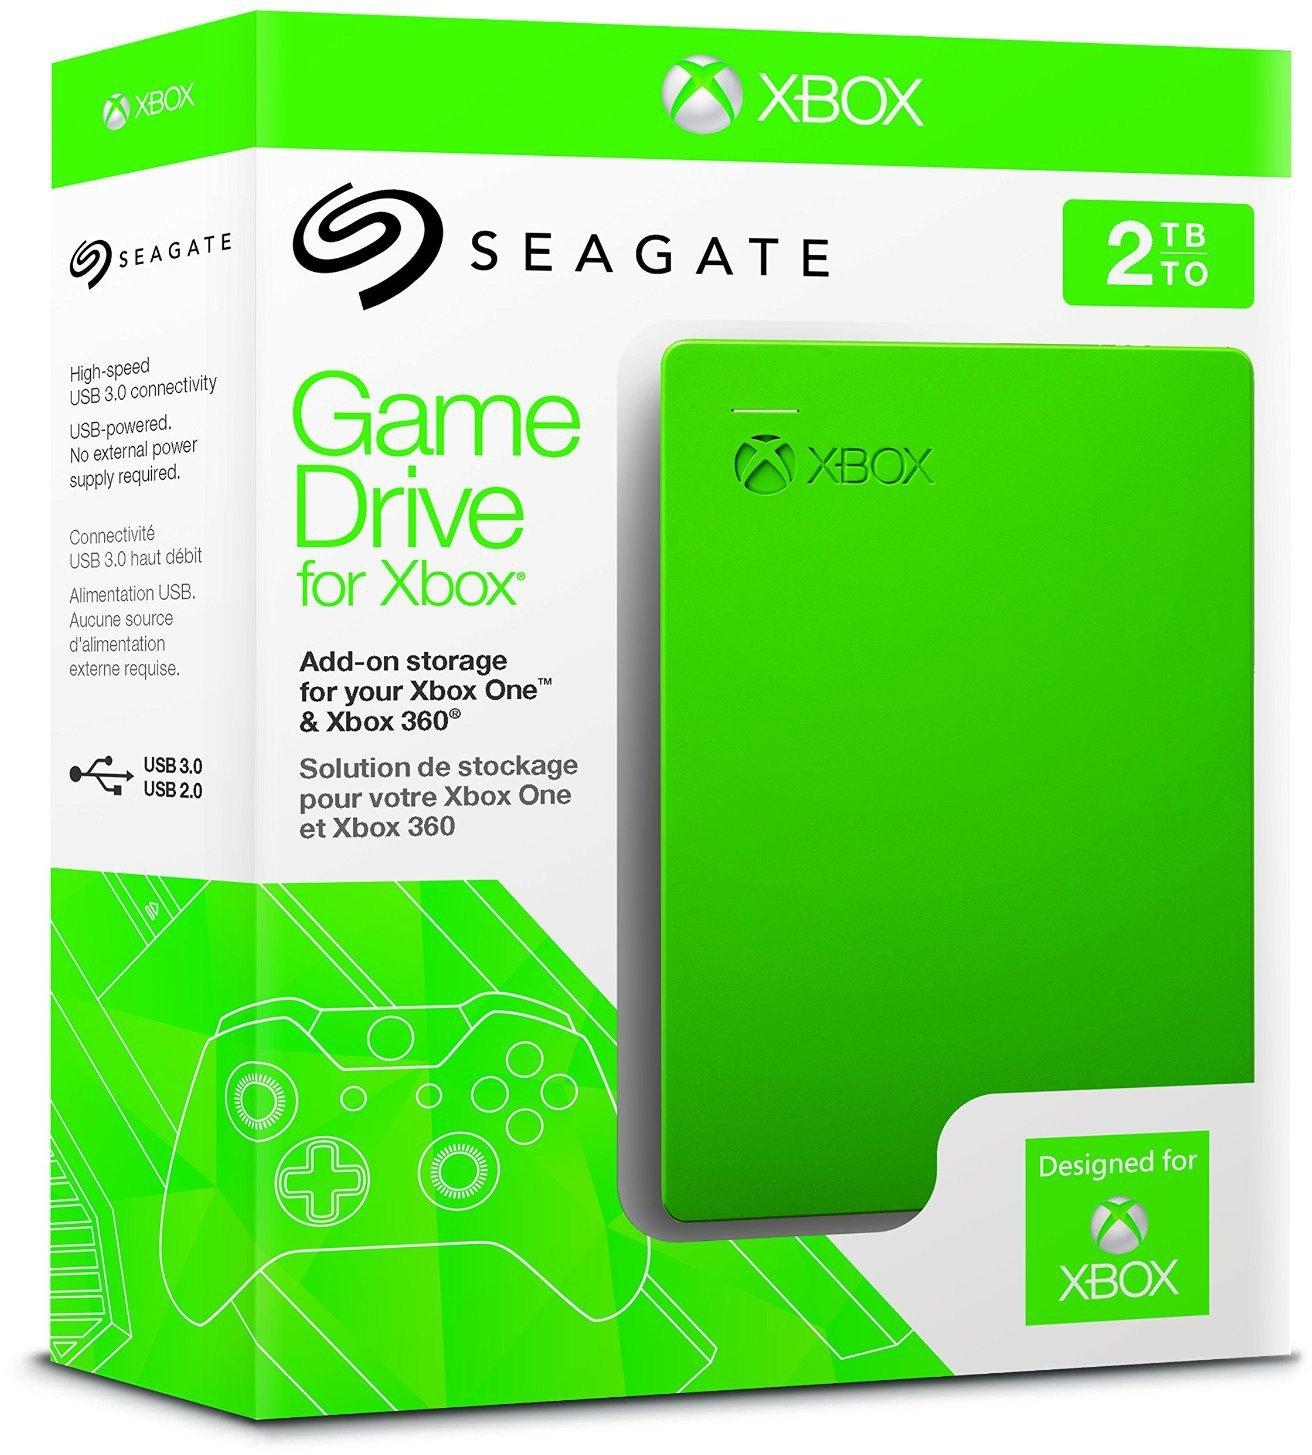 Amazon Seagate Game Drive für Xbox 2TB grün, USB 3.0 + Xbox Live - 10 Euro Guthabenkarte gratis dabei